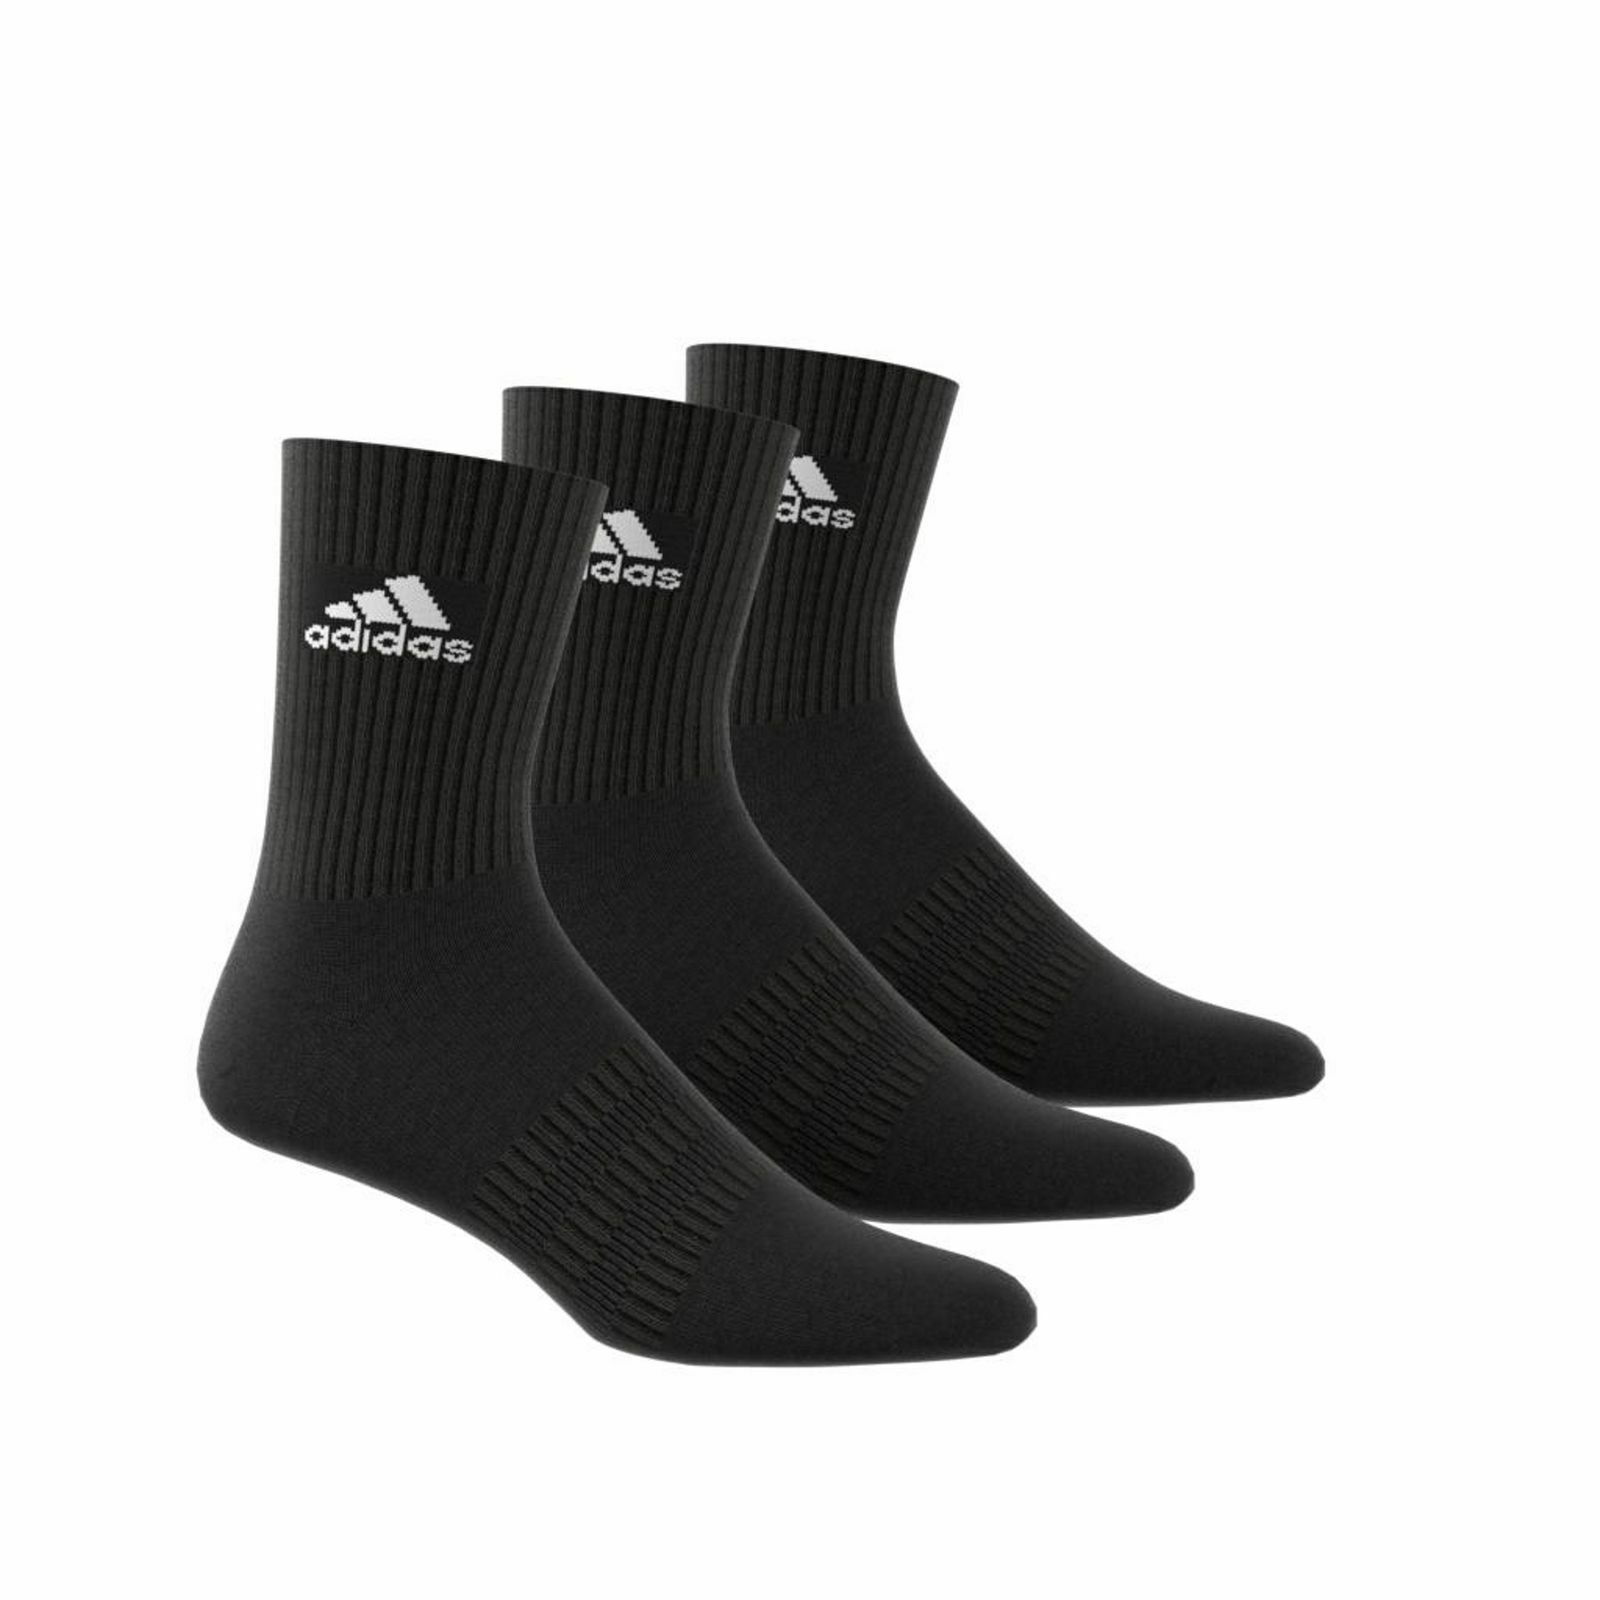 adidas Damen Herren Socken CUSHION CREW Socks Strümpfe schwarz 3er Pack DZ9357